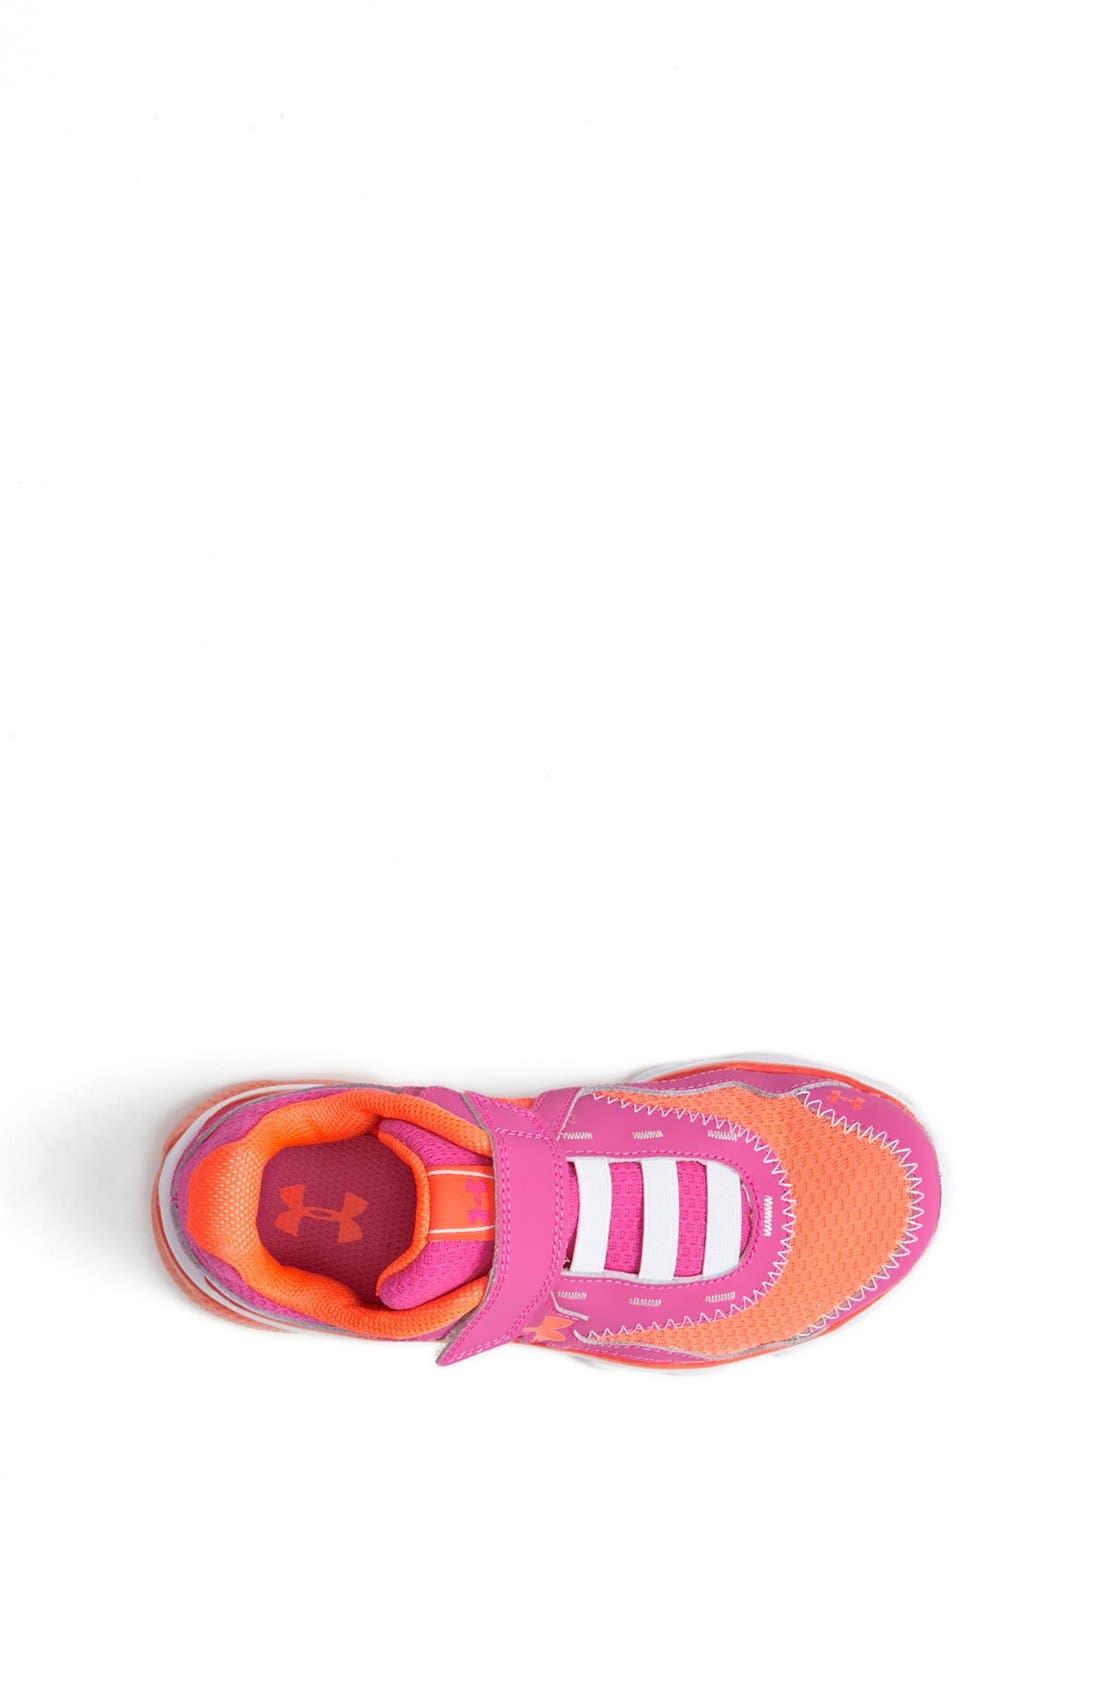 Alternate Image 3  - Under Armour 'Assert III' Athletic Shoe (Baby, Walker, Toddler & Little Kid)